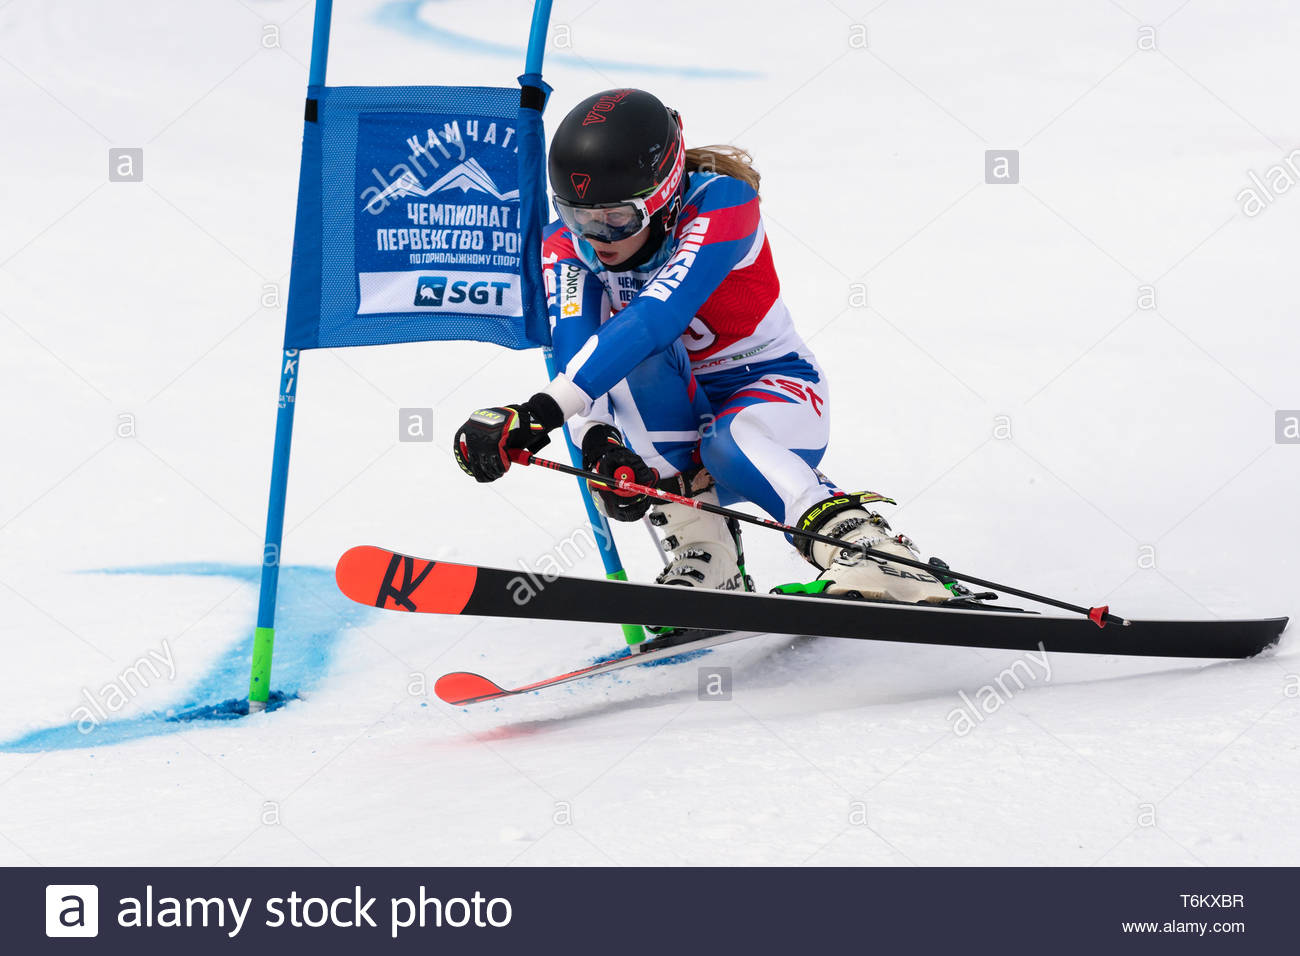 KAMCHATKA PENINSULA, RUSSIA - APR 2, 2019: Russian Women's Alpine Skiing Cup, International Ski Federation Championship, giant slalom. Mountain skier  - Stock Image